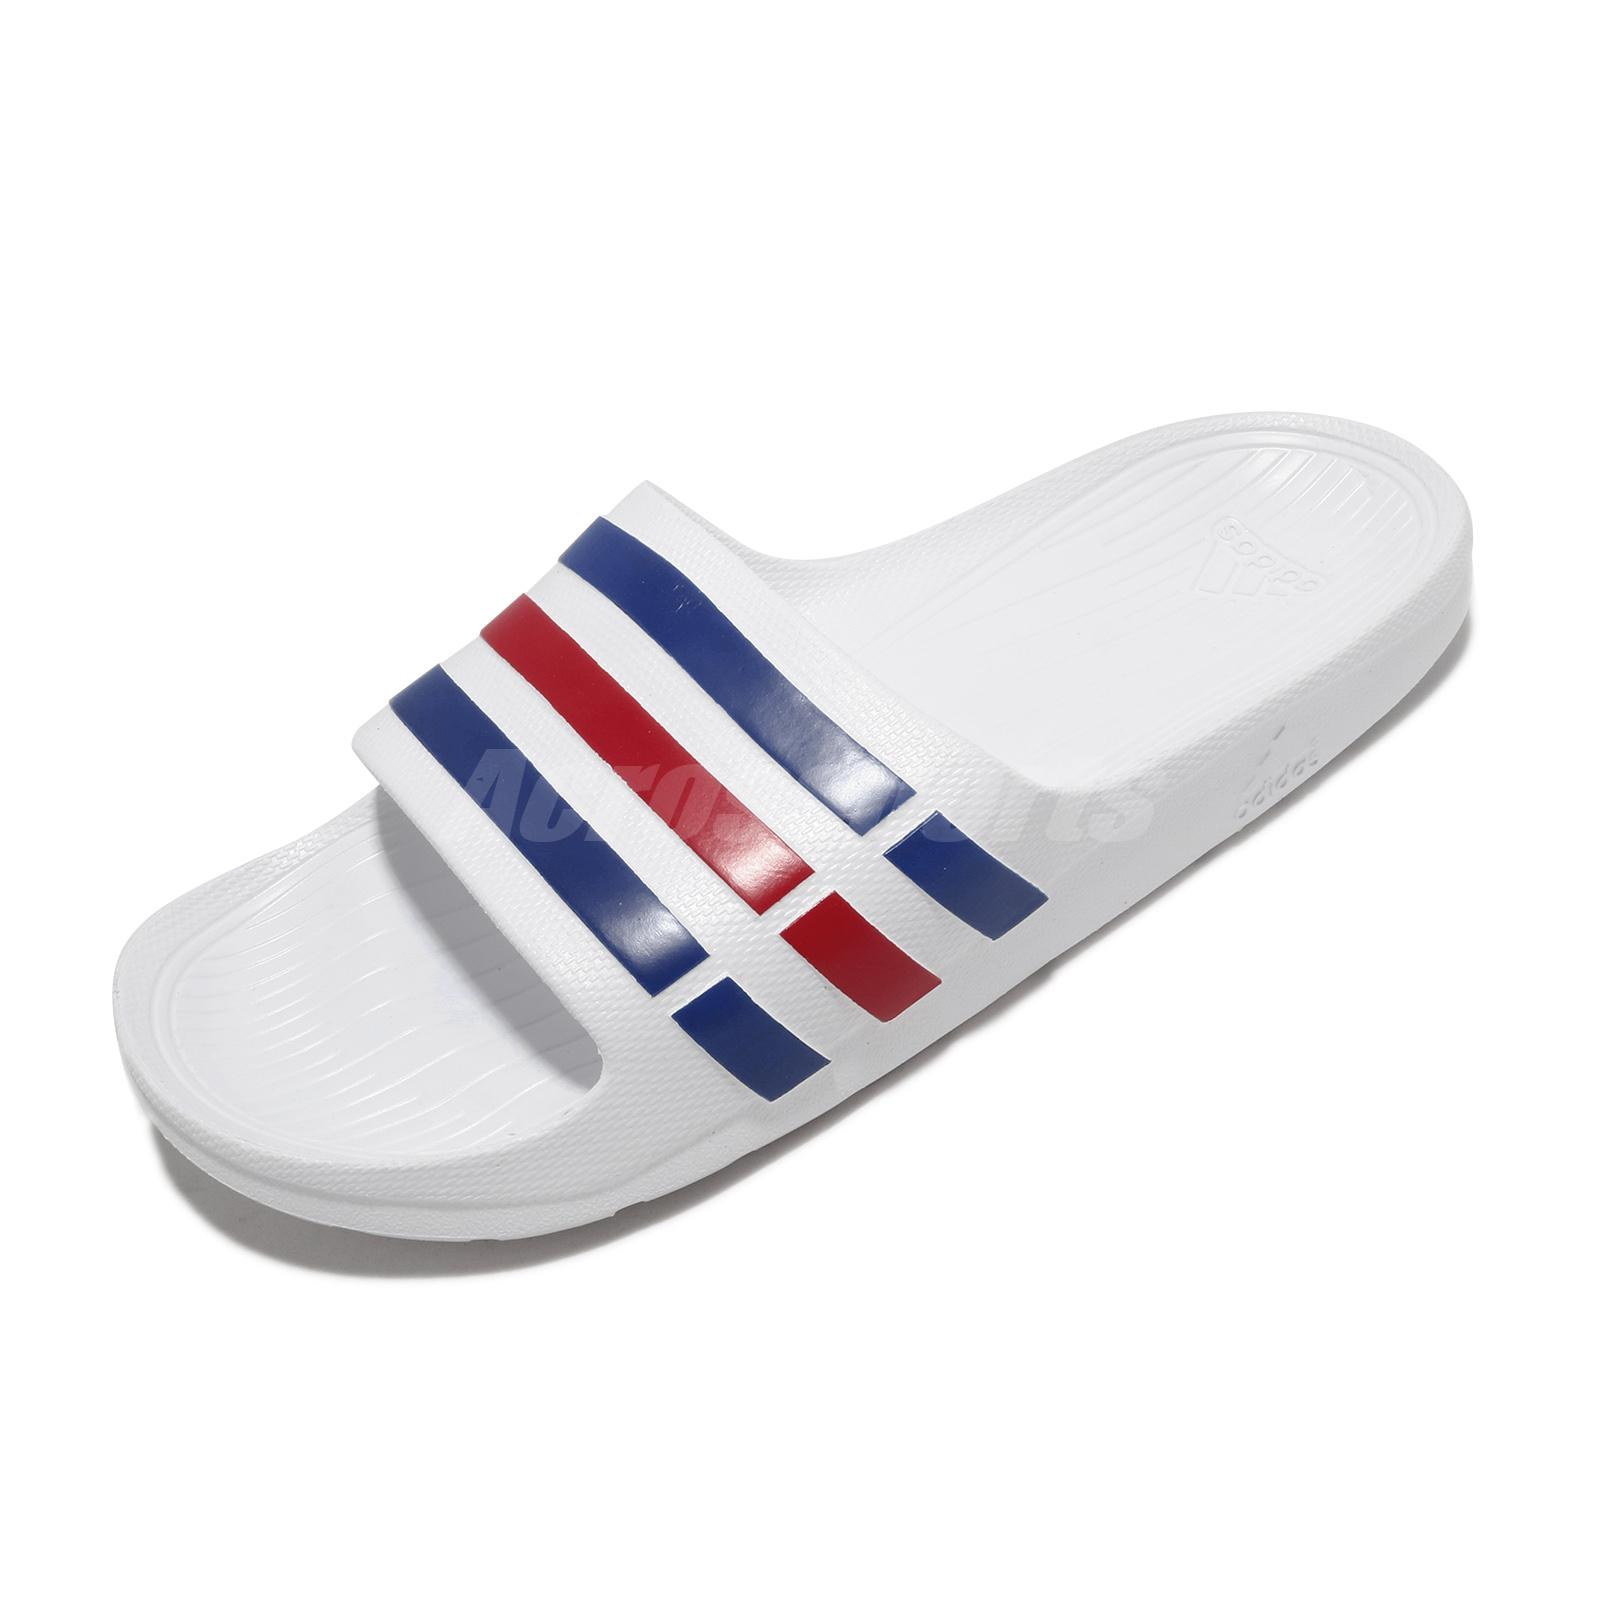 adidas Duramo Slide White Blue Red Mens Womens Sports Slide Slippers U43664 74d4cb512